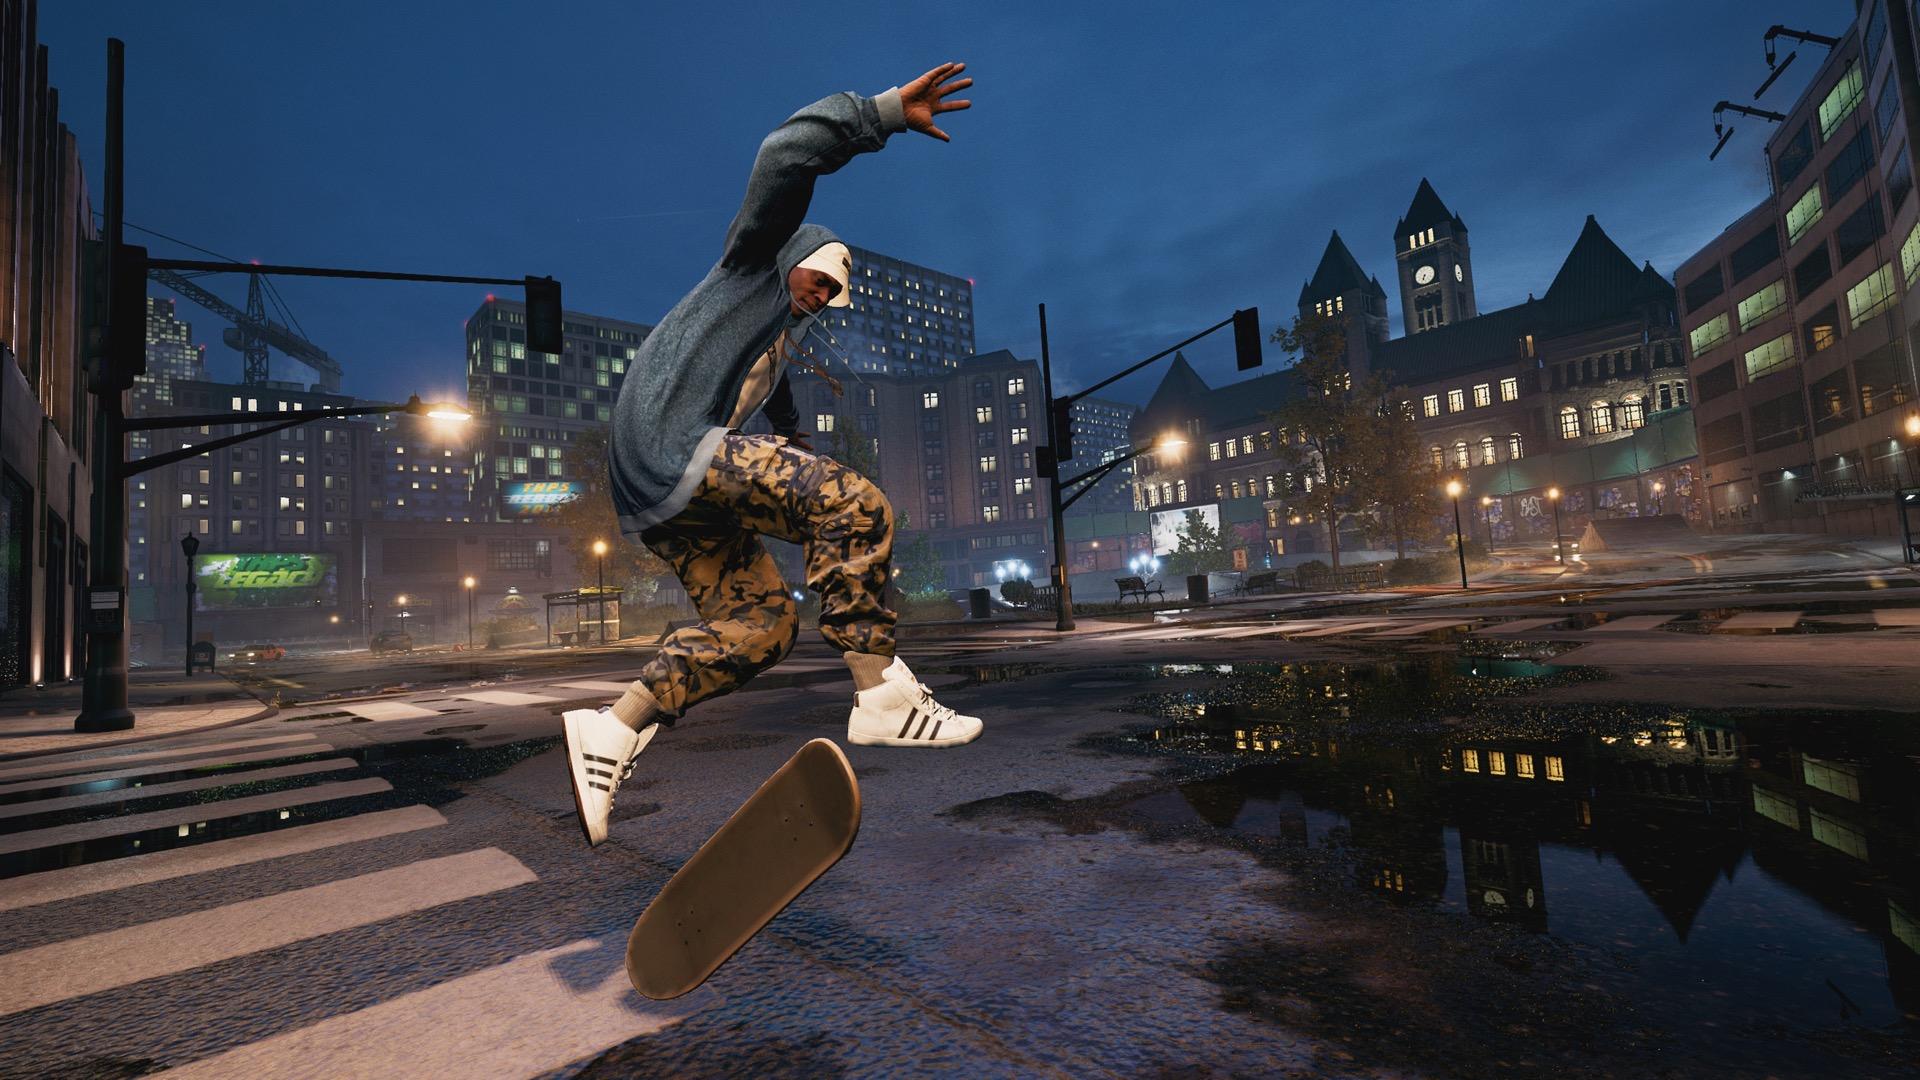 Tony Hawk's Pro Skater 1&2 Remaster Adds 8 New Athletes